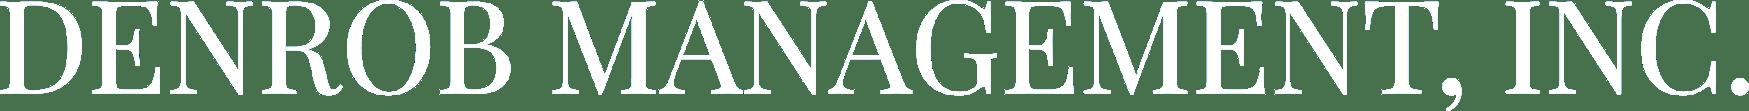 Denrob Management, Inc. Logo